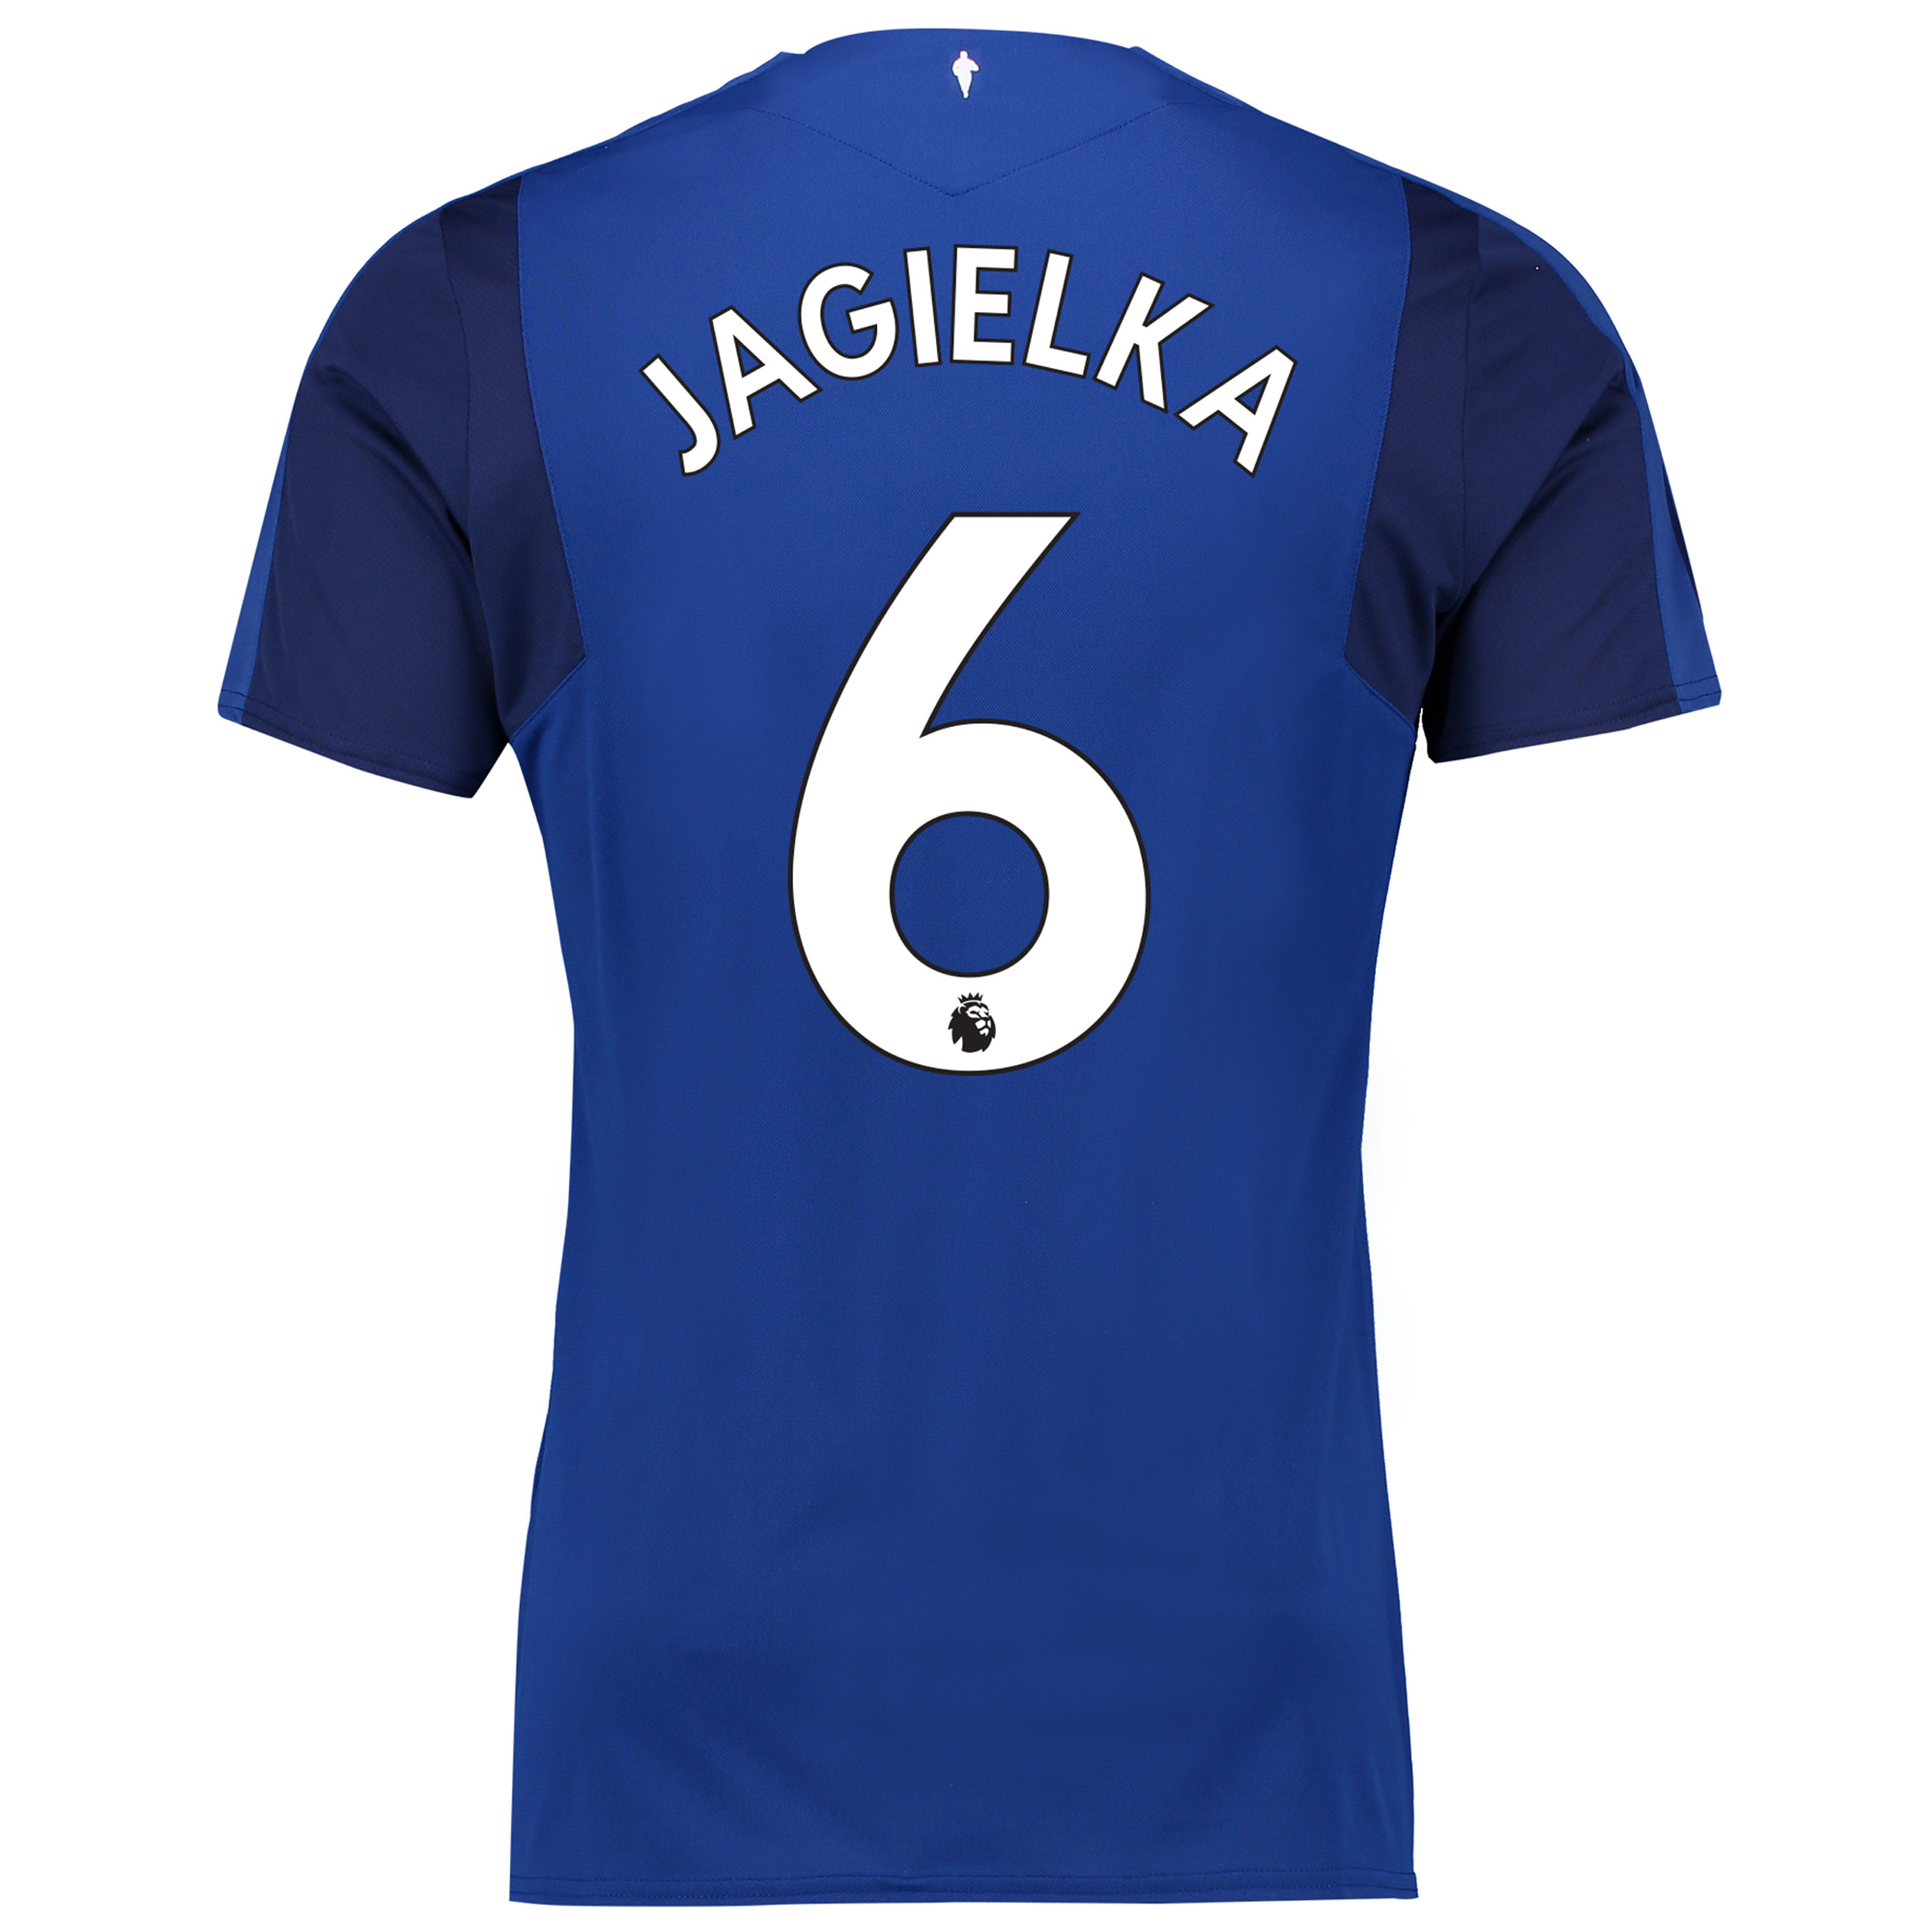 Everton Home Shirt 2017/18 with Jagielka 6 printing